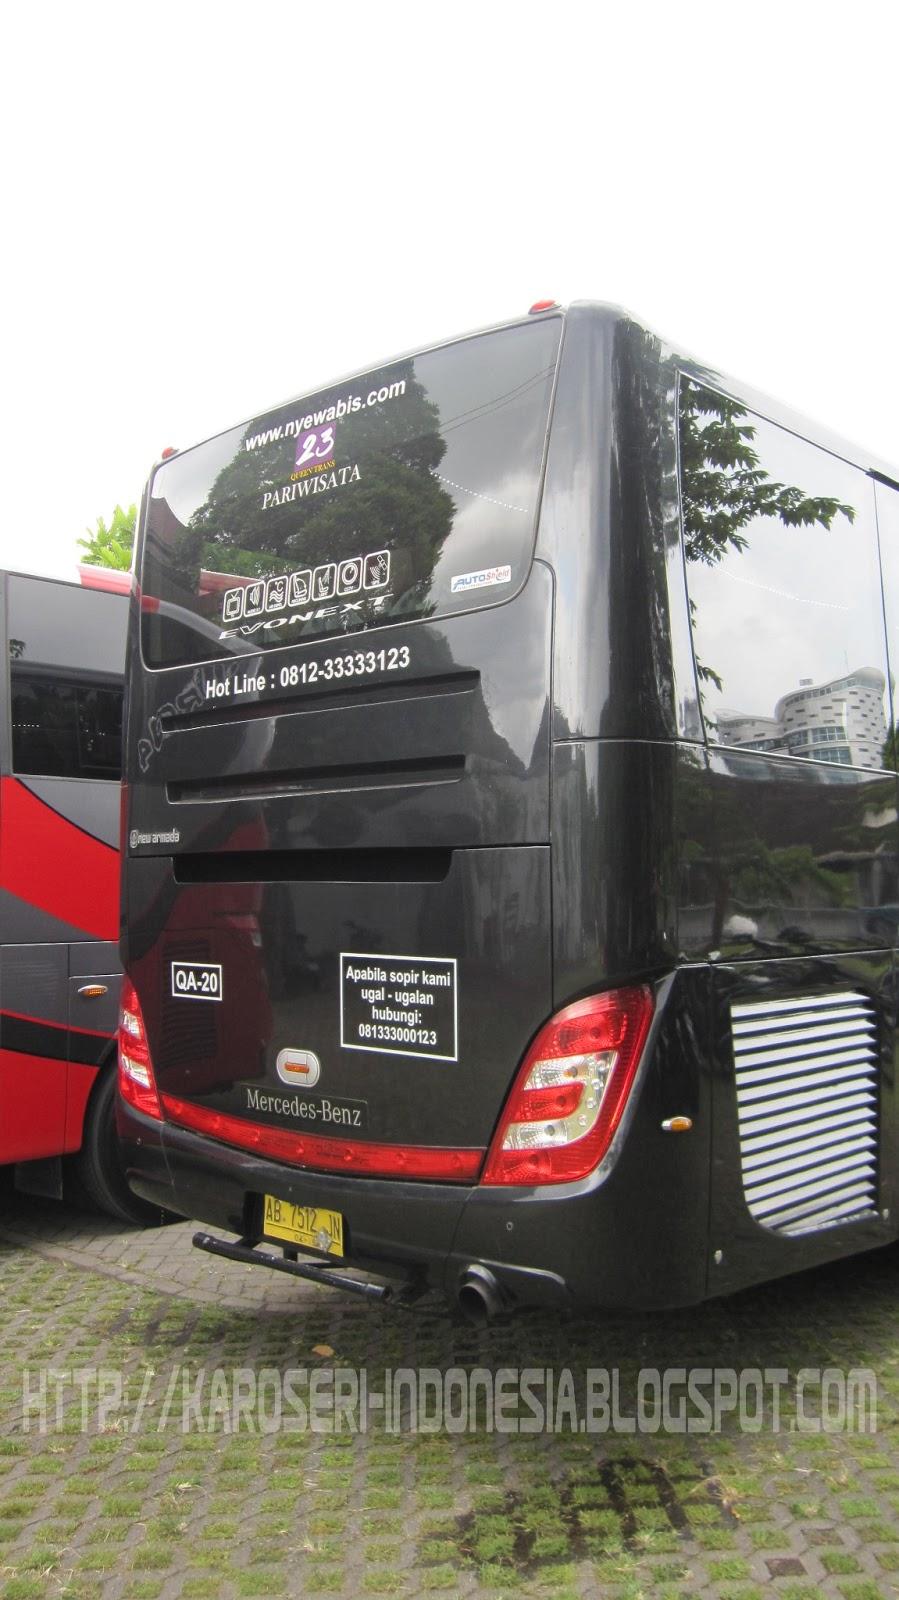 Jetbus Hd Adi Putro Vs Evonext New Armada Terbaru | Share The Knownledge